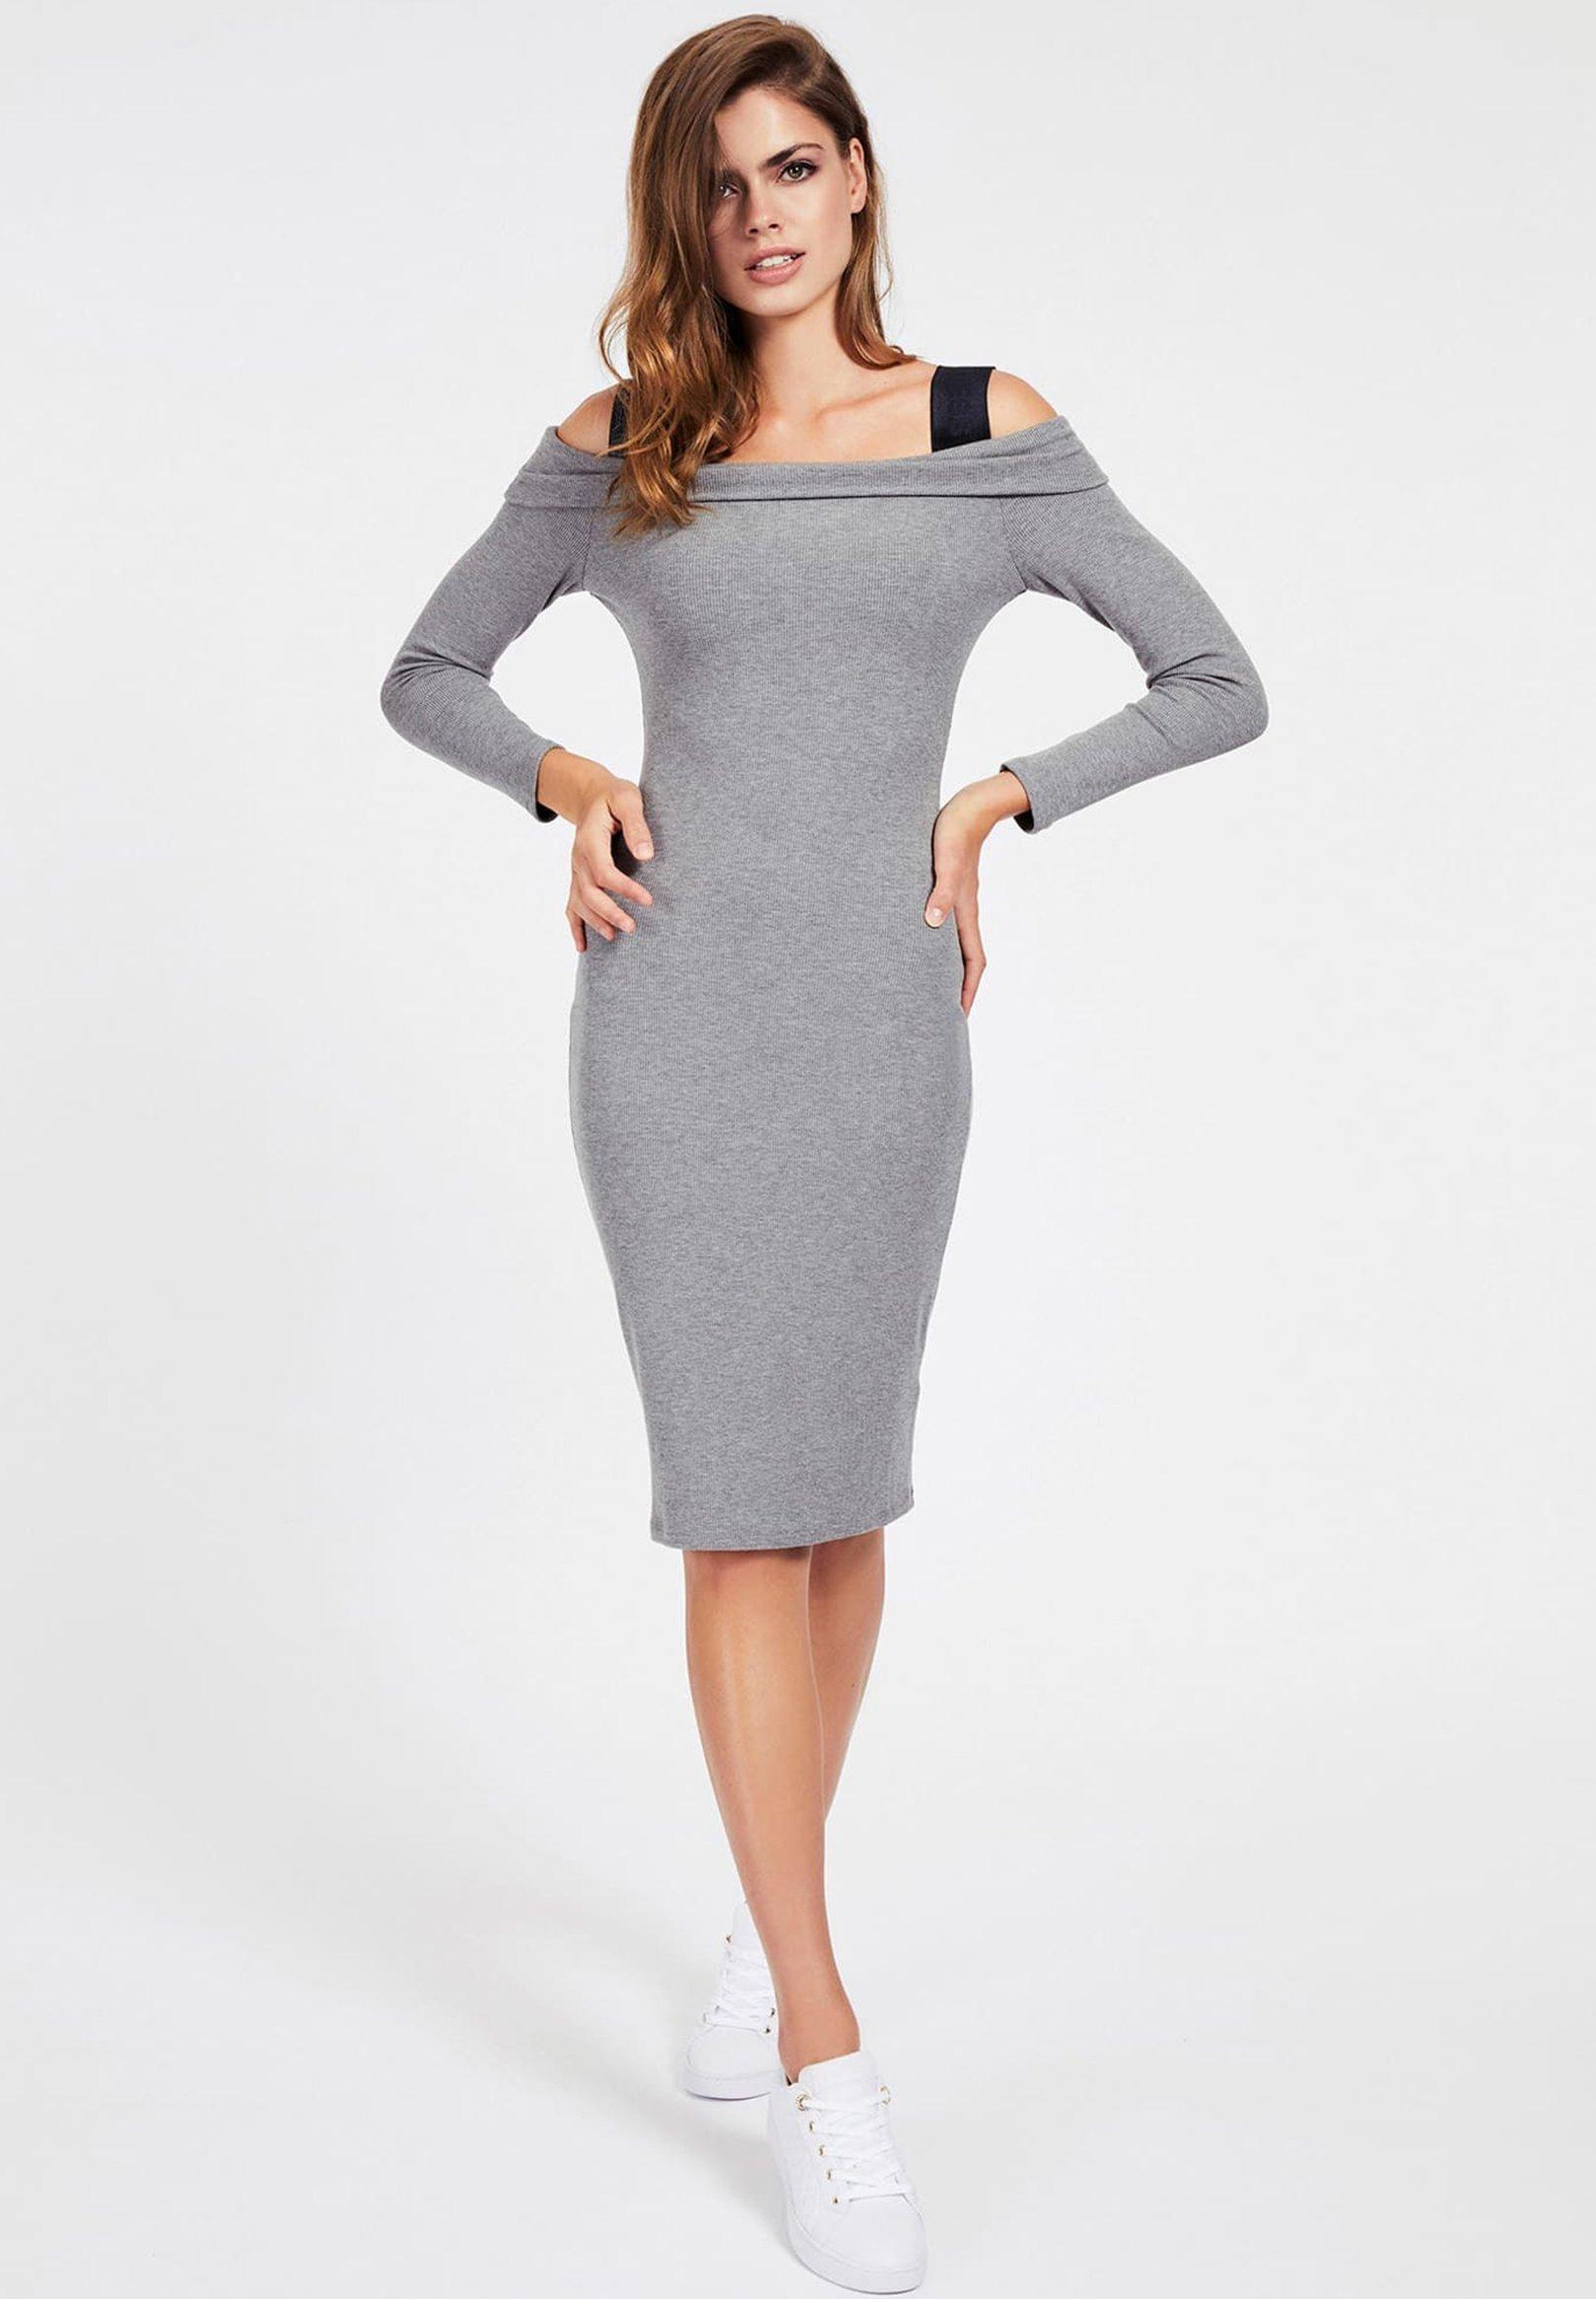 Guess FABIANA  - Robe fourreau - gris - Robes femme dzHPB